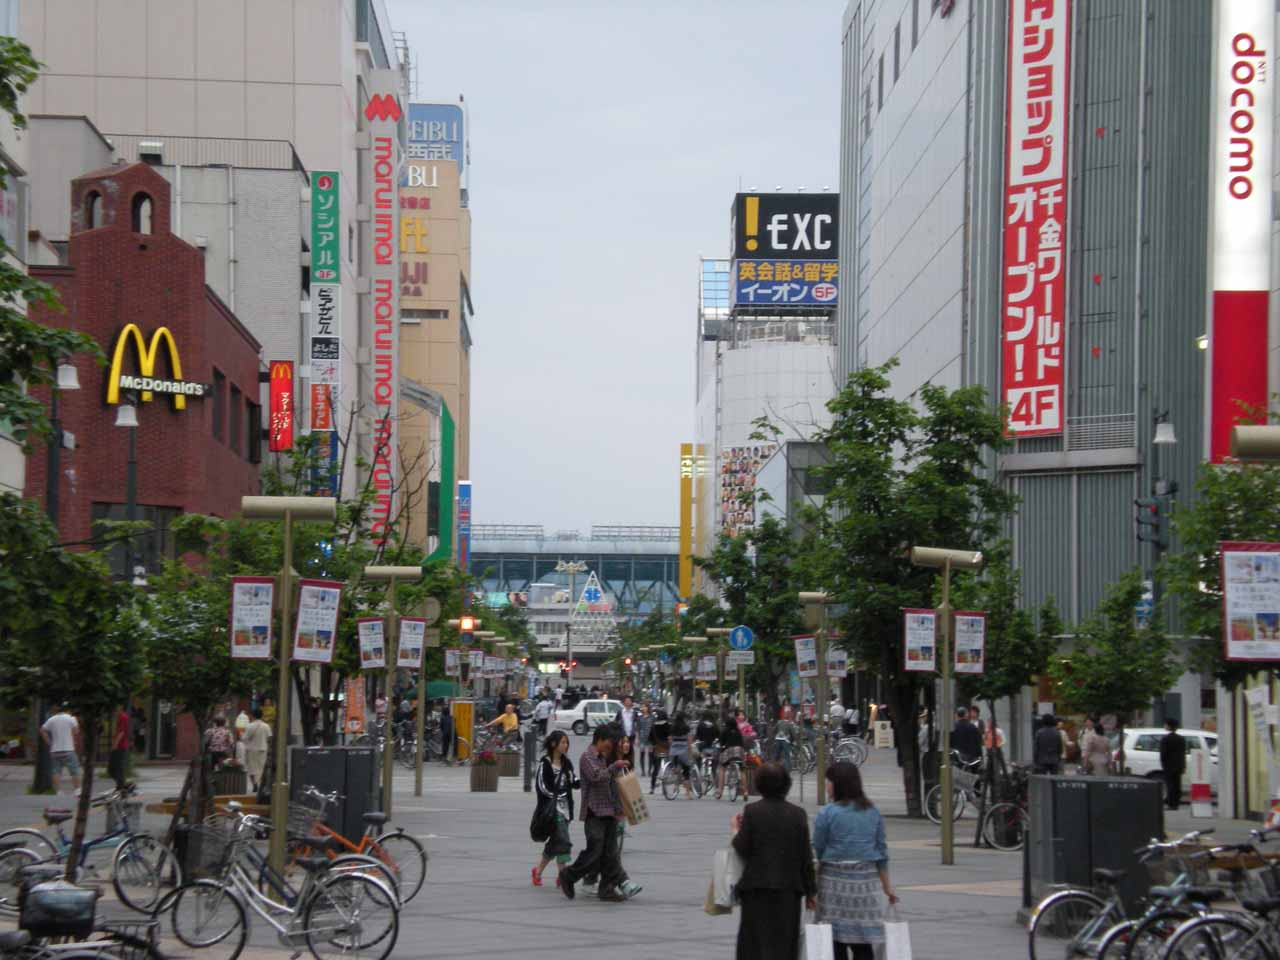 Walking the somewhat happening streets of Asahikawa